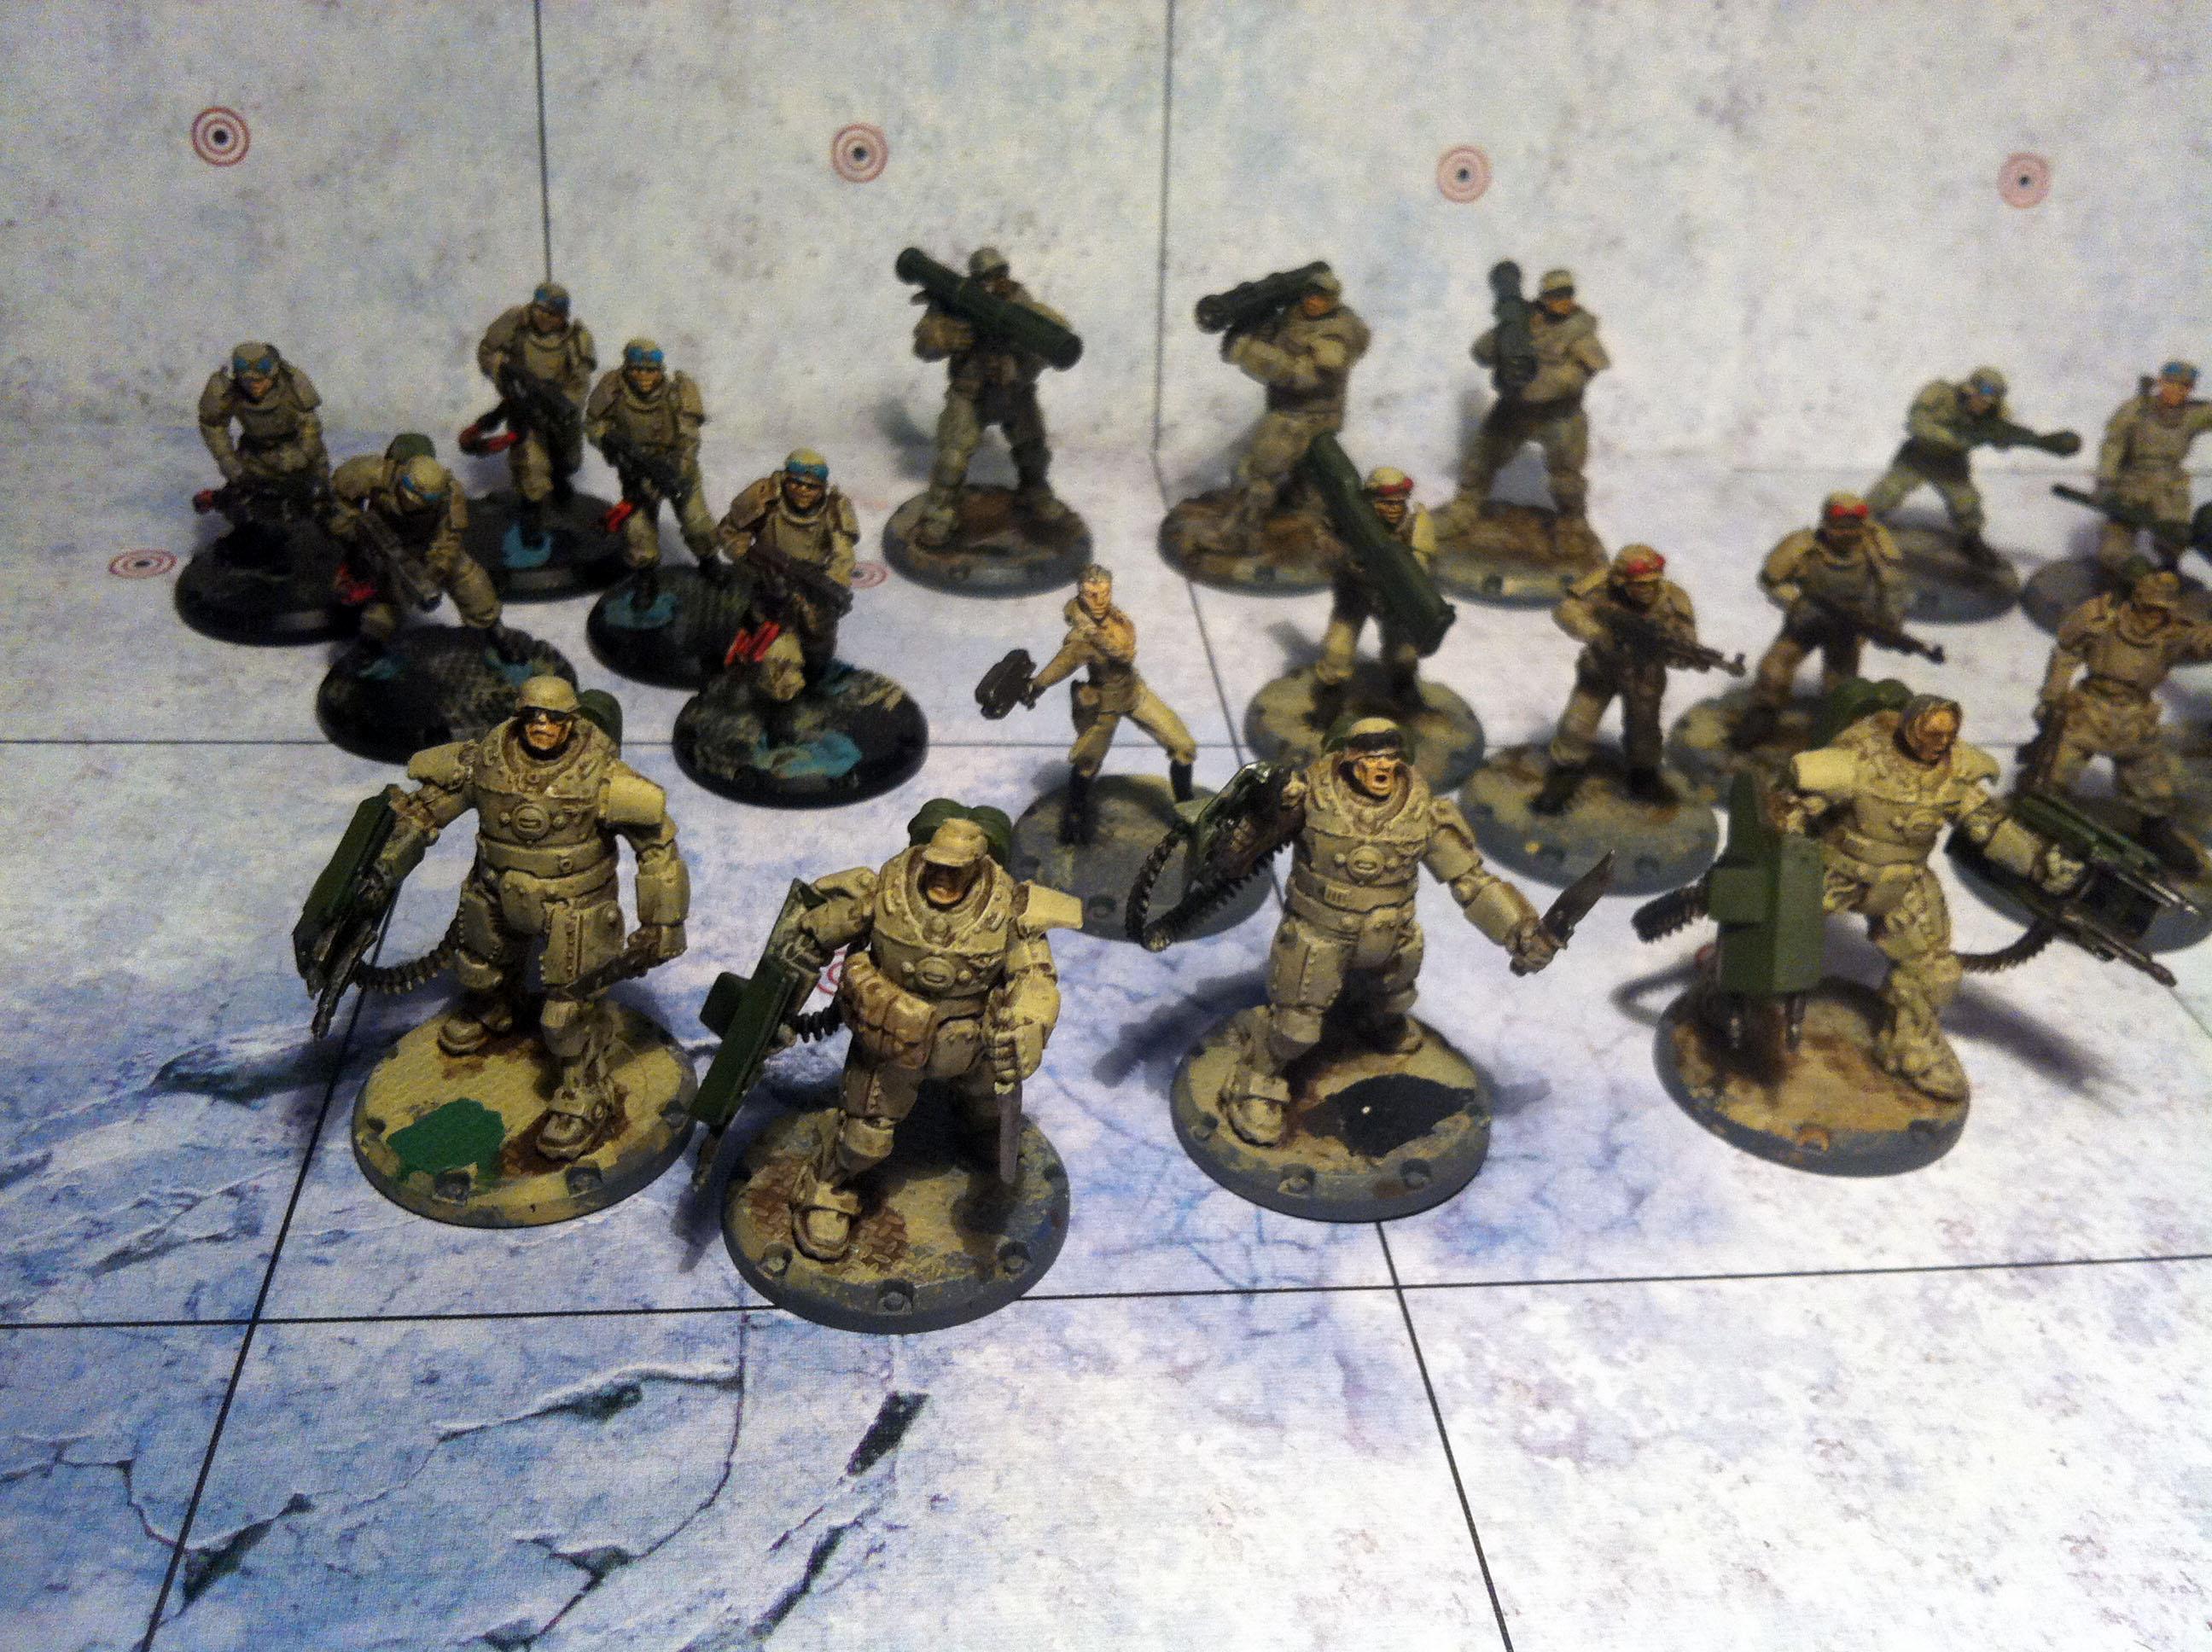 Axis, Dust, Dust Tactics, Dust Warfare, Hans, Loth, Mech, Pulp, Walker, Wierd War 2, Wierd War Ii, World War 2